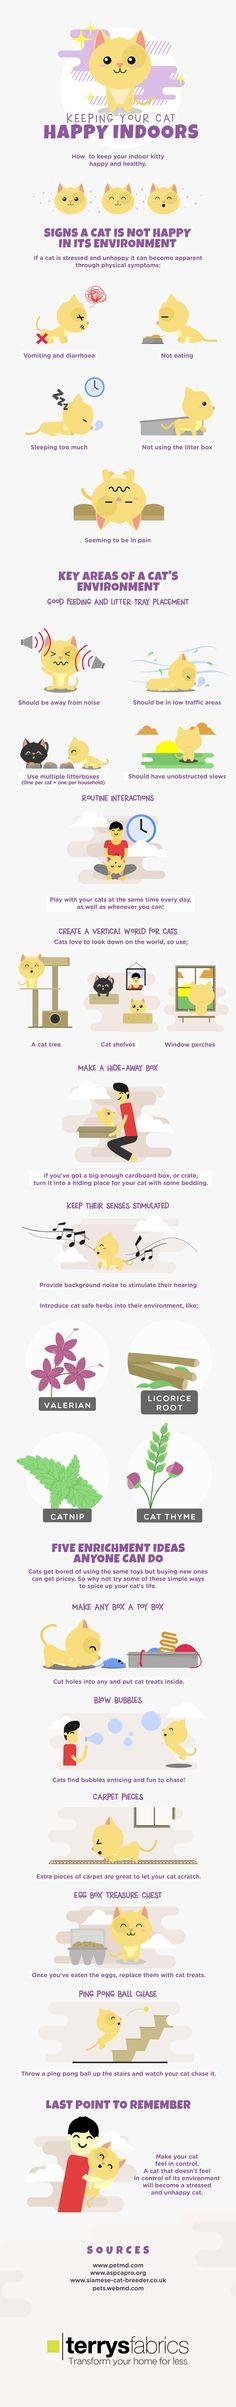 @hotinfographics : How To Keep Indoor Cats Happy Infographic - https://t.co/hsSu033PE9